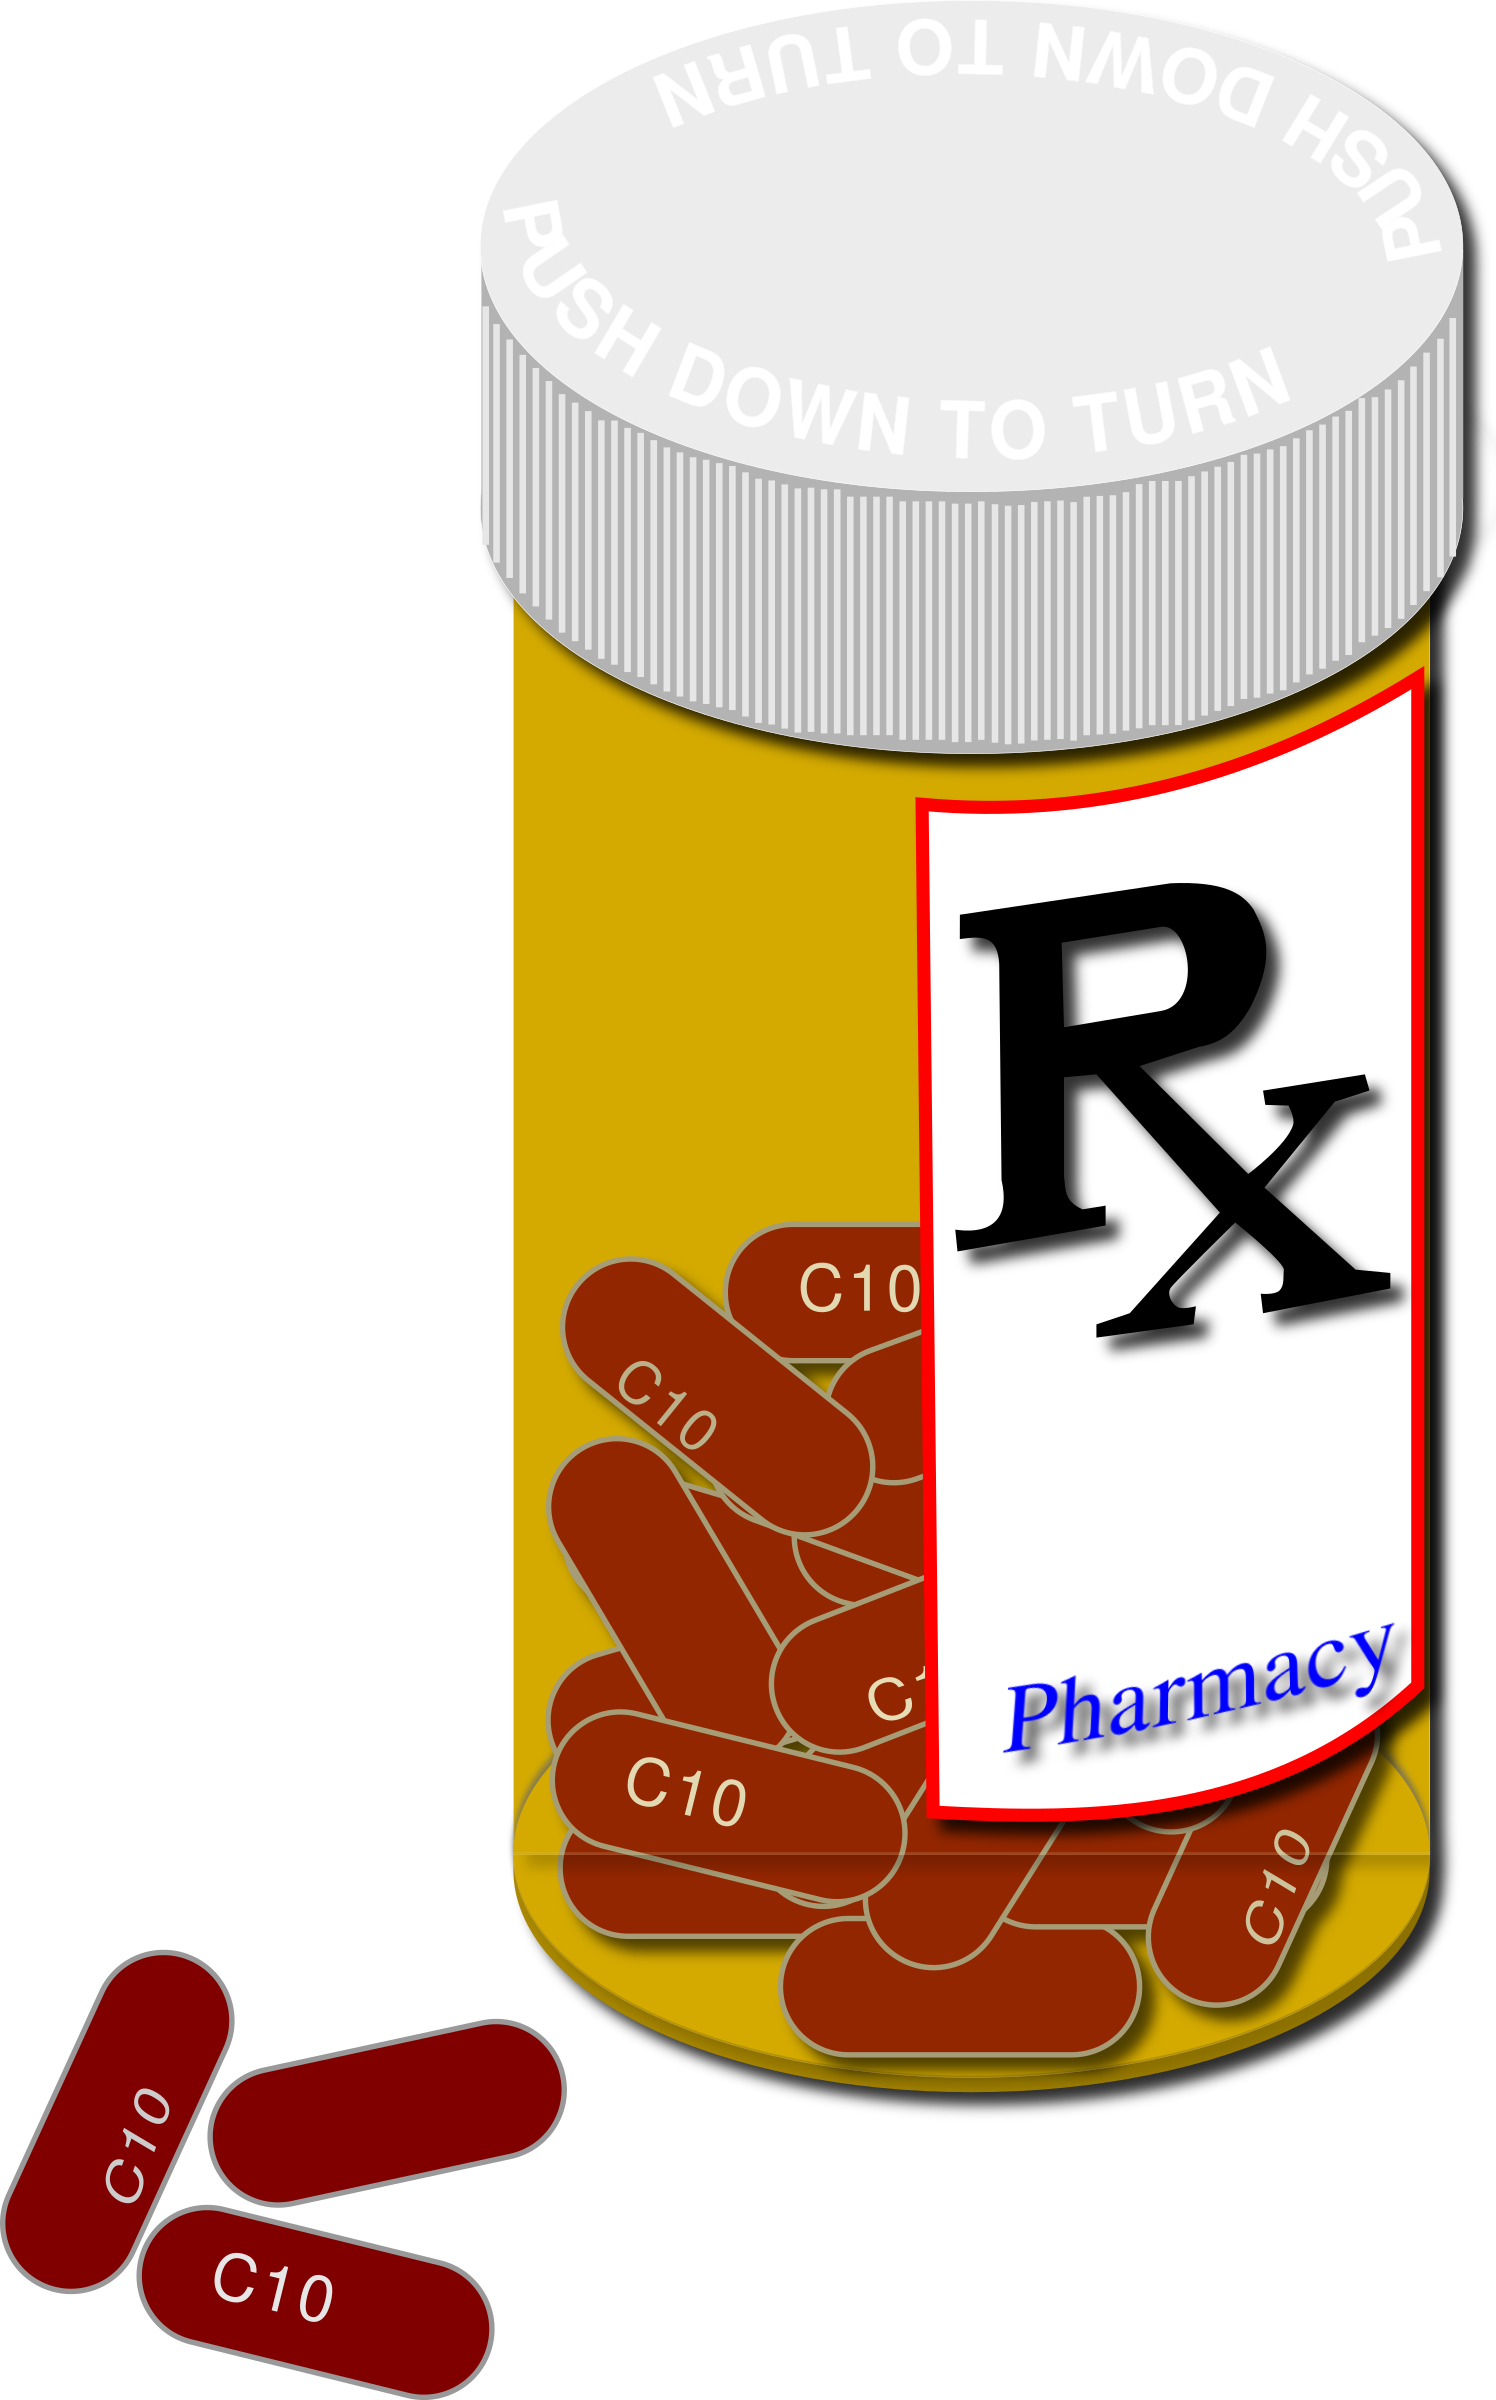 Prescription bottle clipart png freeuse stock Clipart prescription bottle and pills - ClipartBarn png freeuse stock